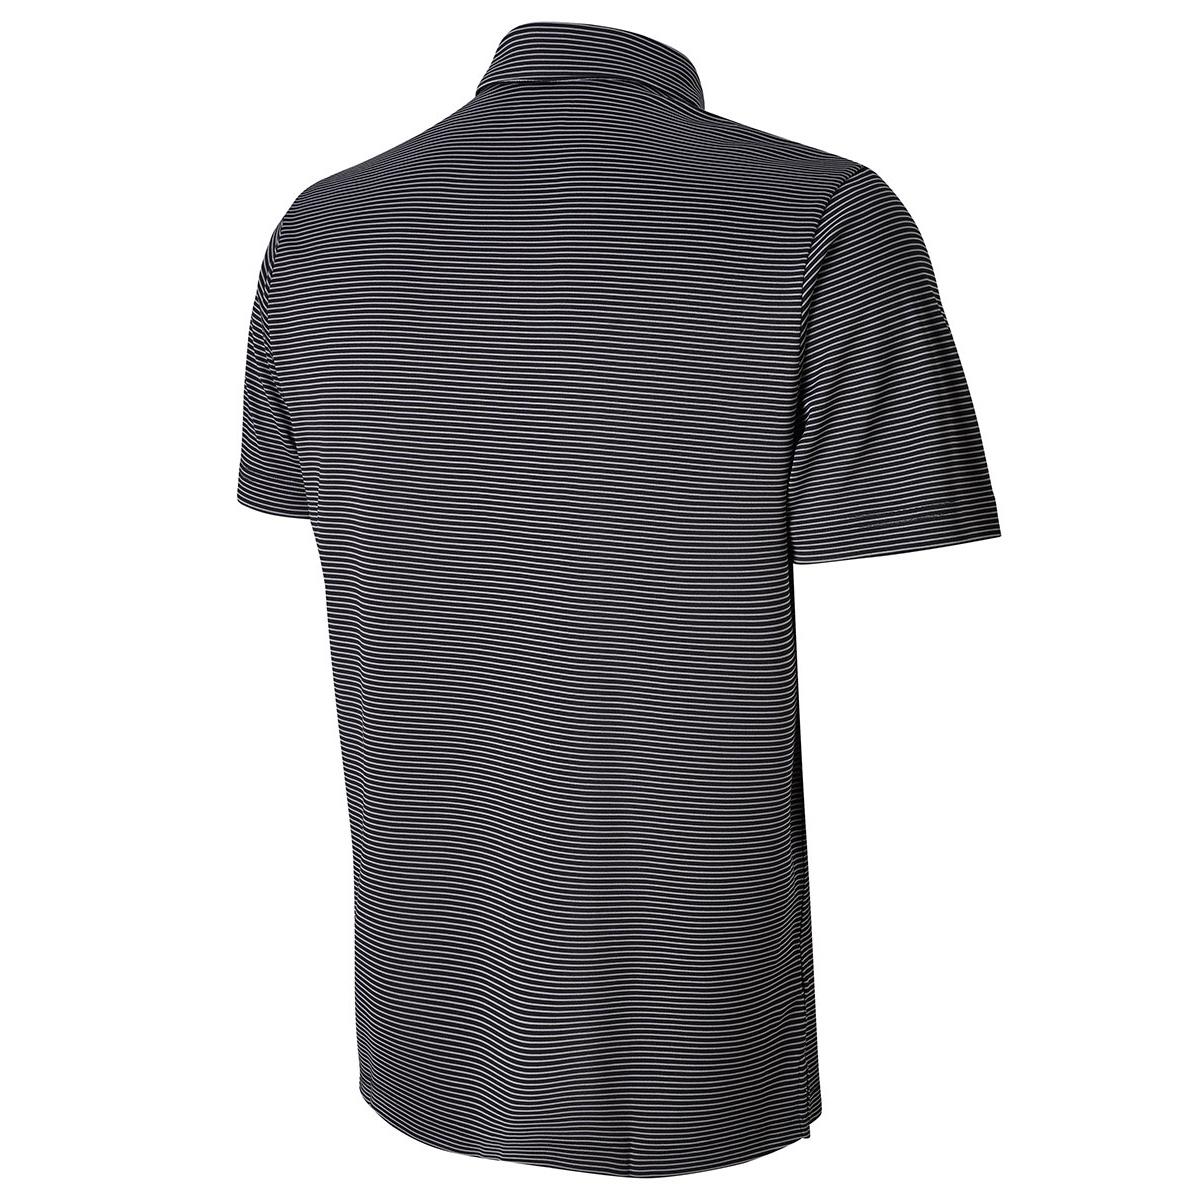 pga tour feeder stripe polo shirt from american golf